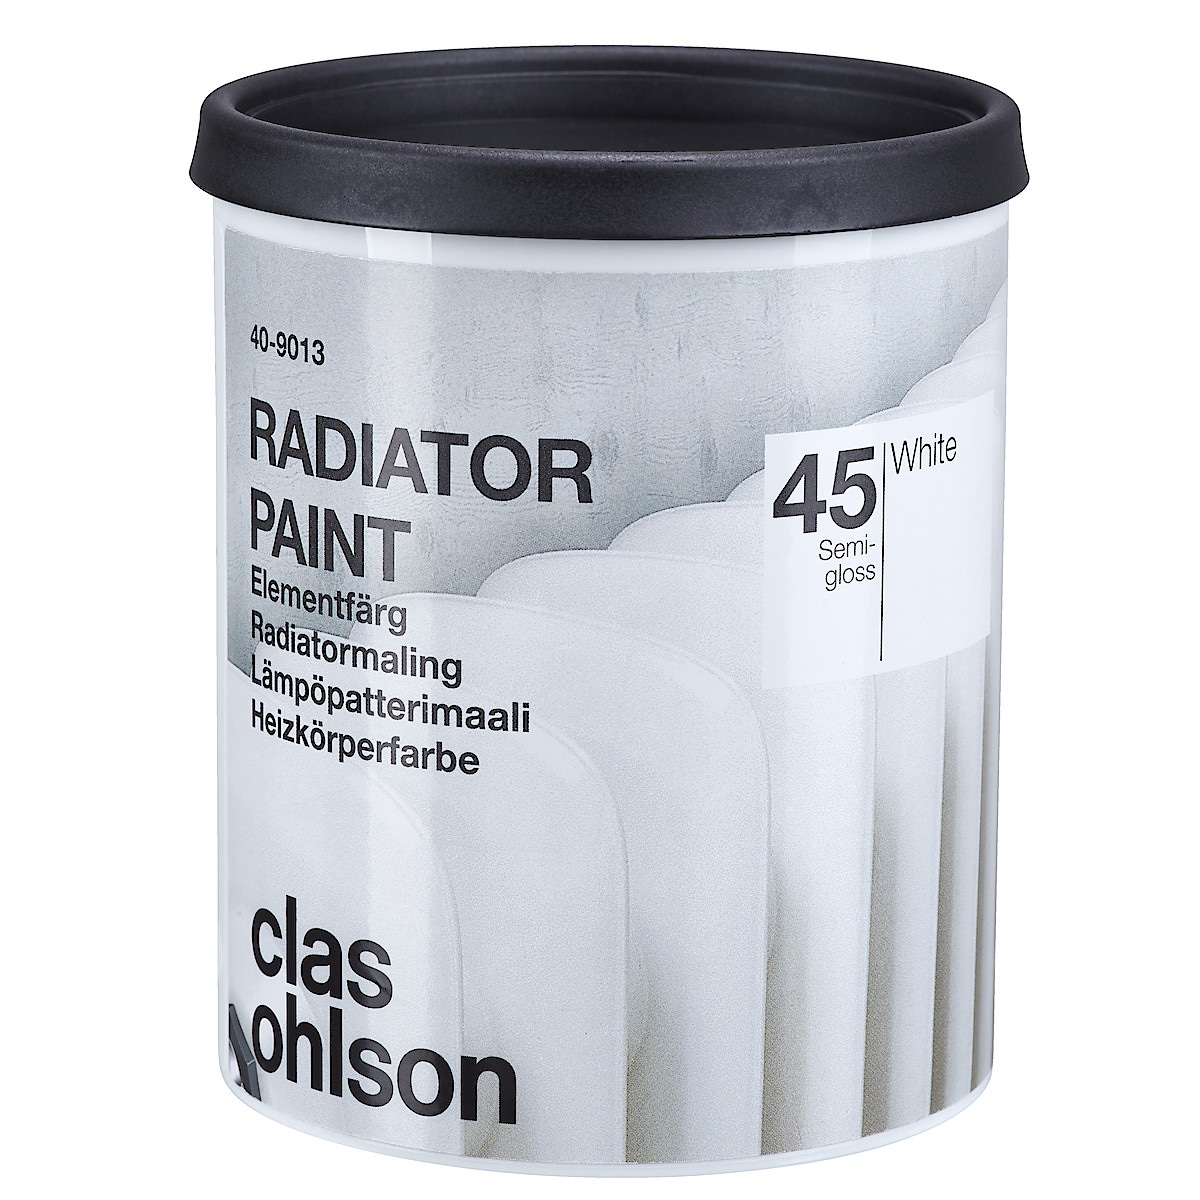 CRC Pro Paint spraylakk | Clas Ohlson